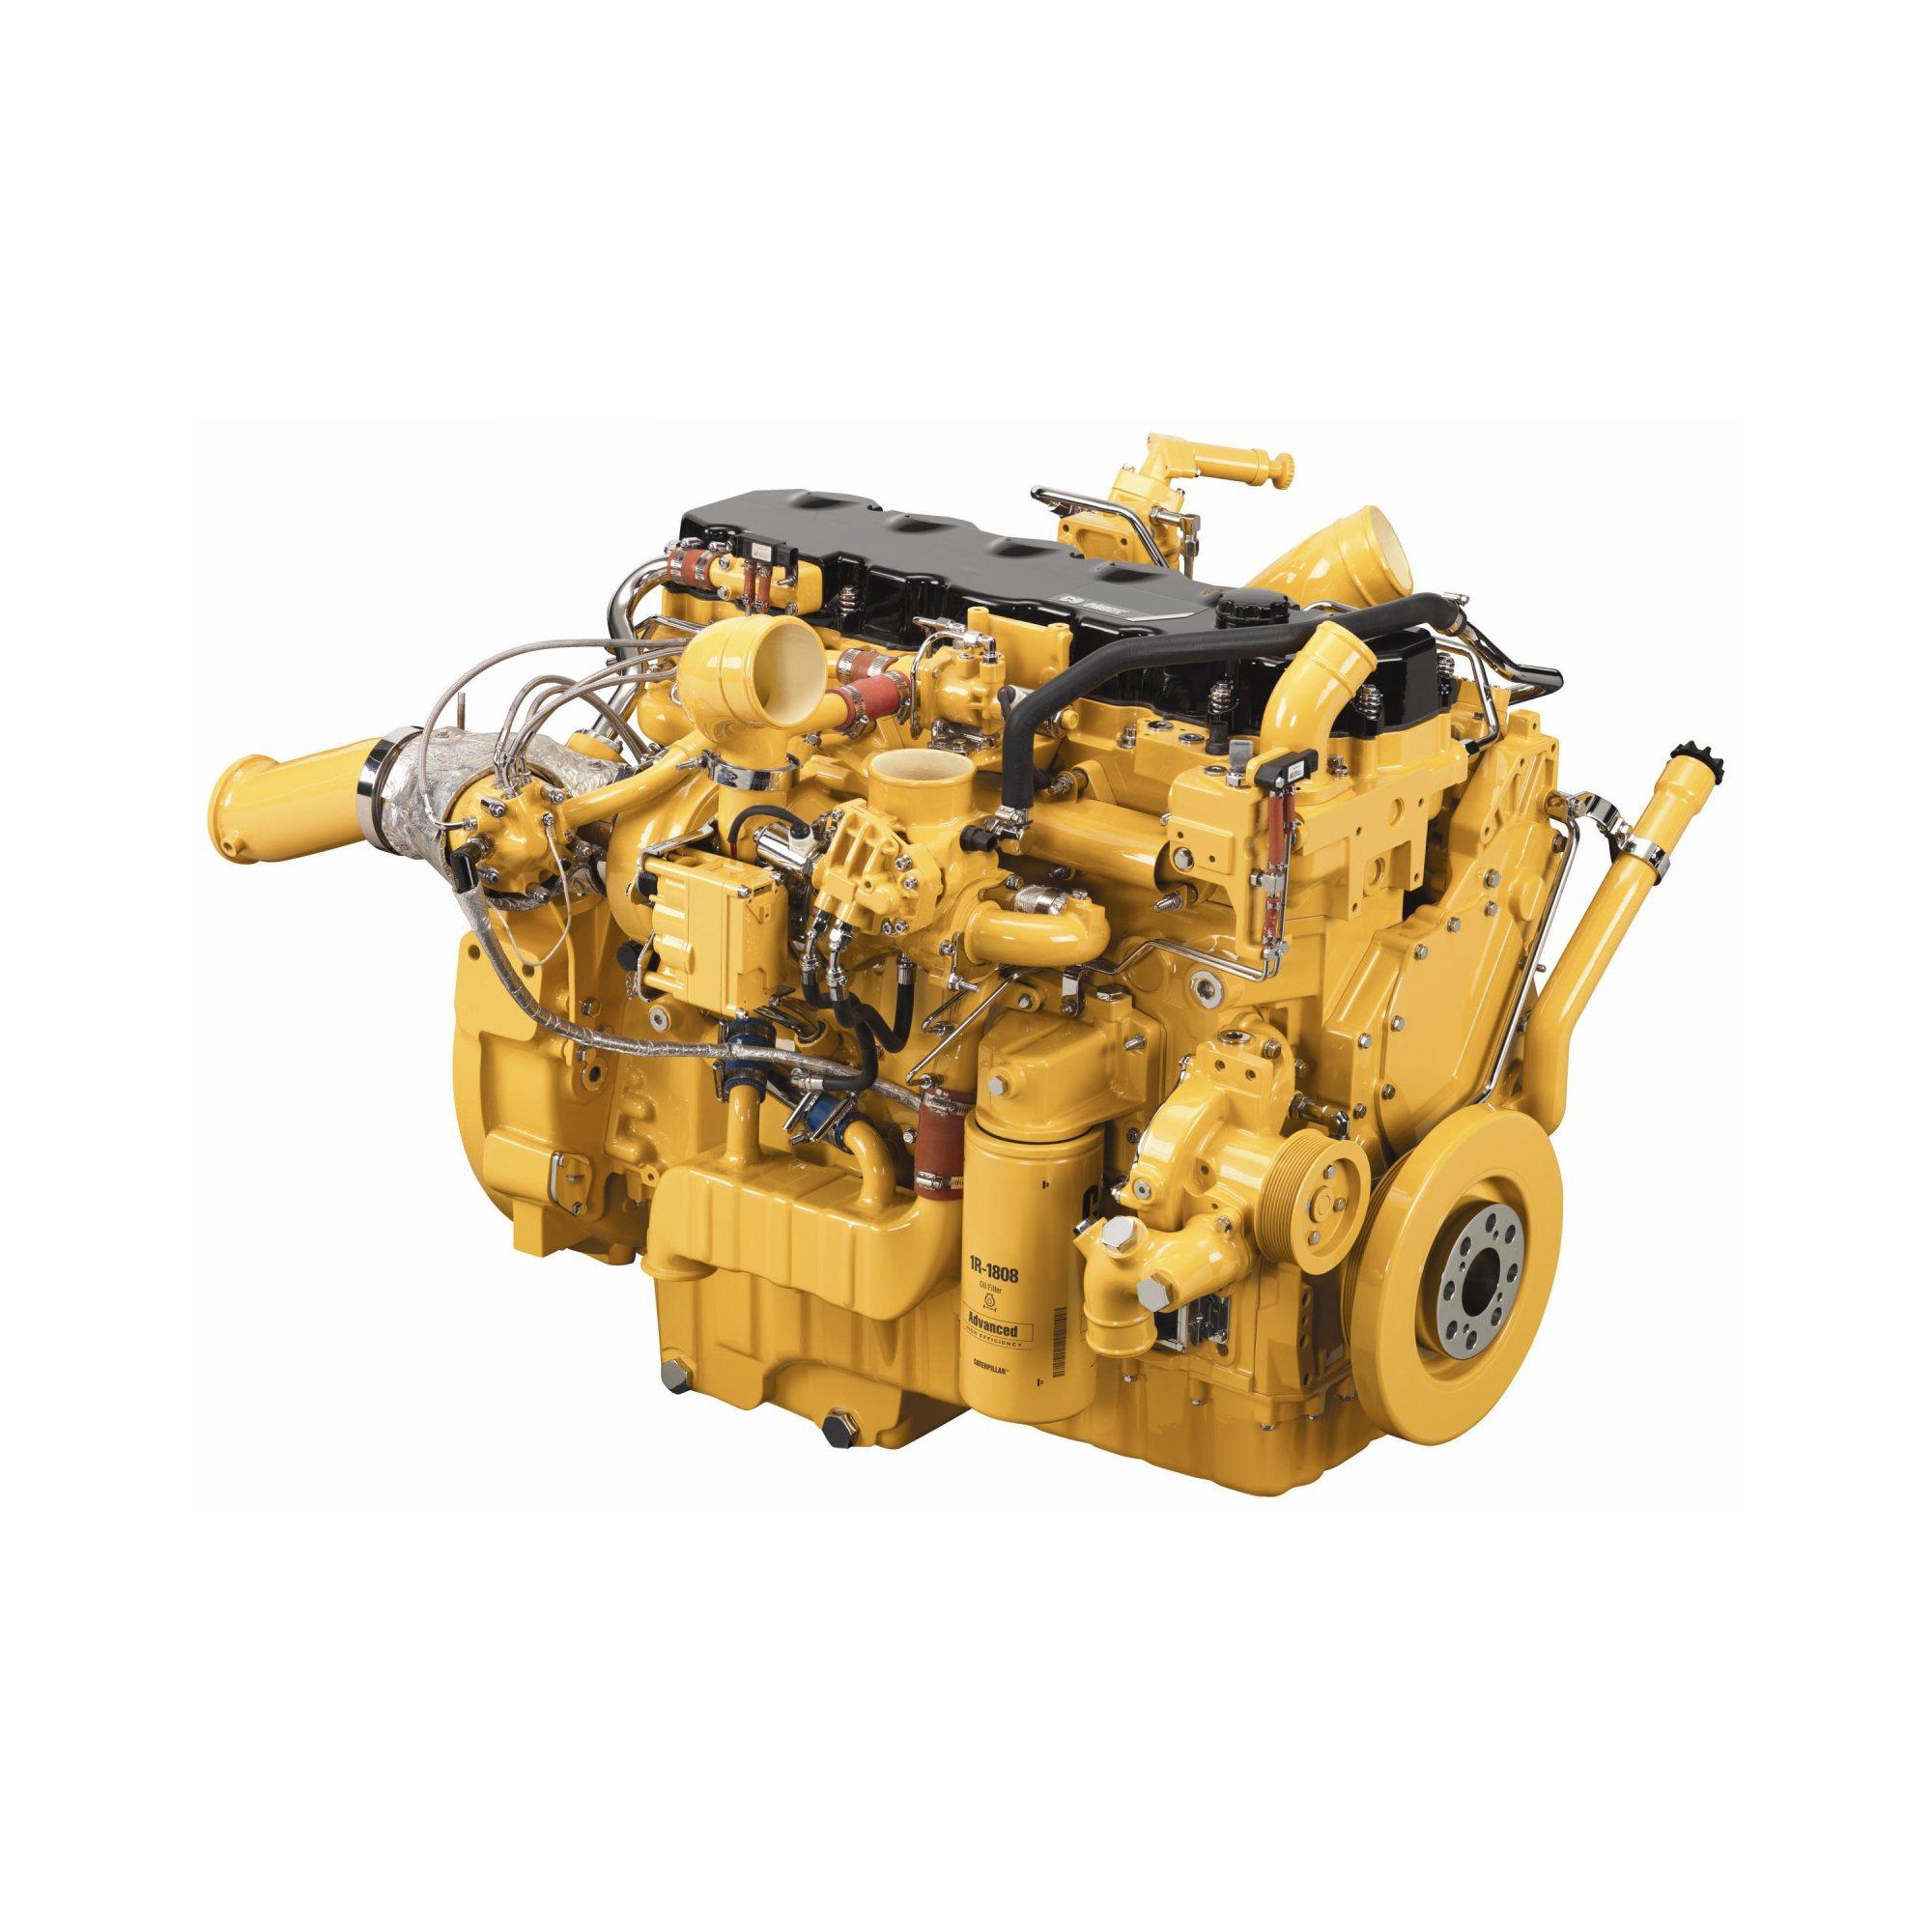 hight resolution of c7 cat engine breakdown diagram